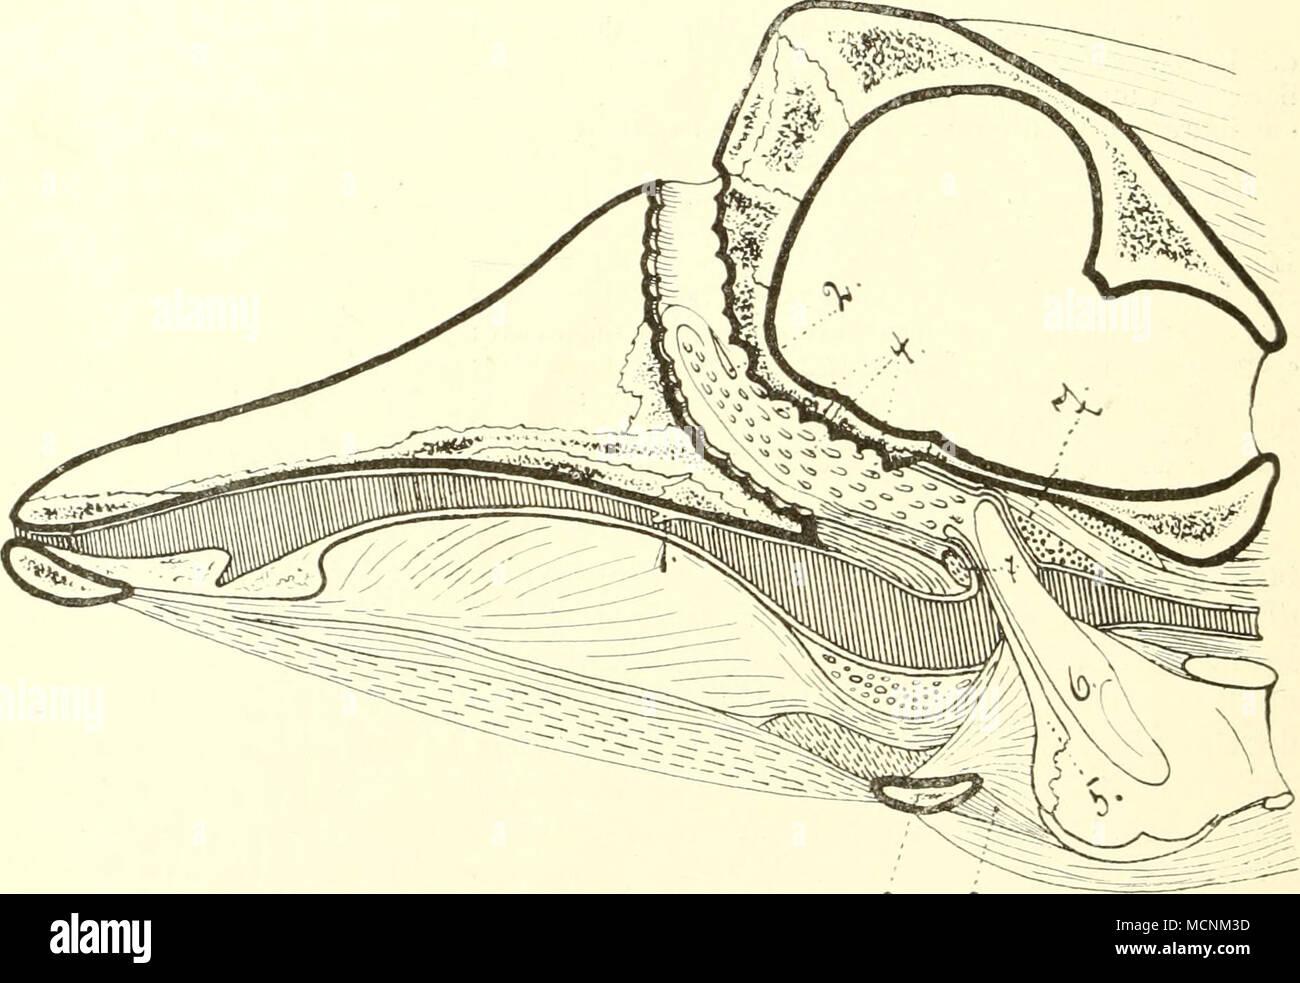 Pharynx Epiglottis Stockfotos & Pharynx Epiglottis Bilder - Alamy